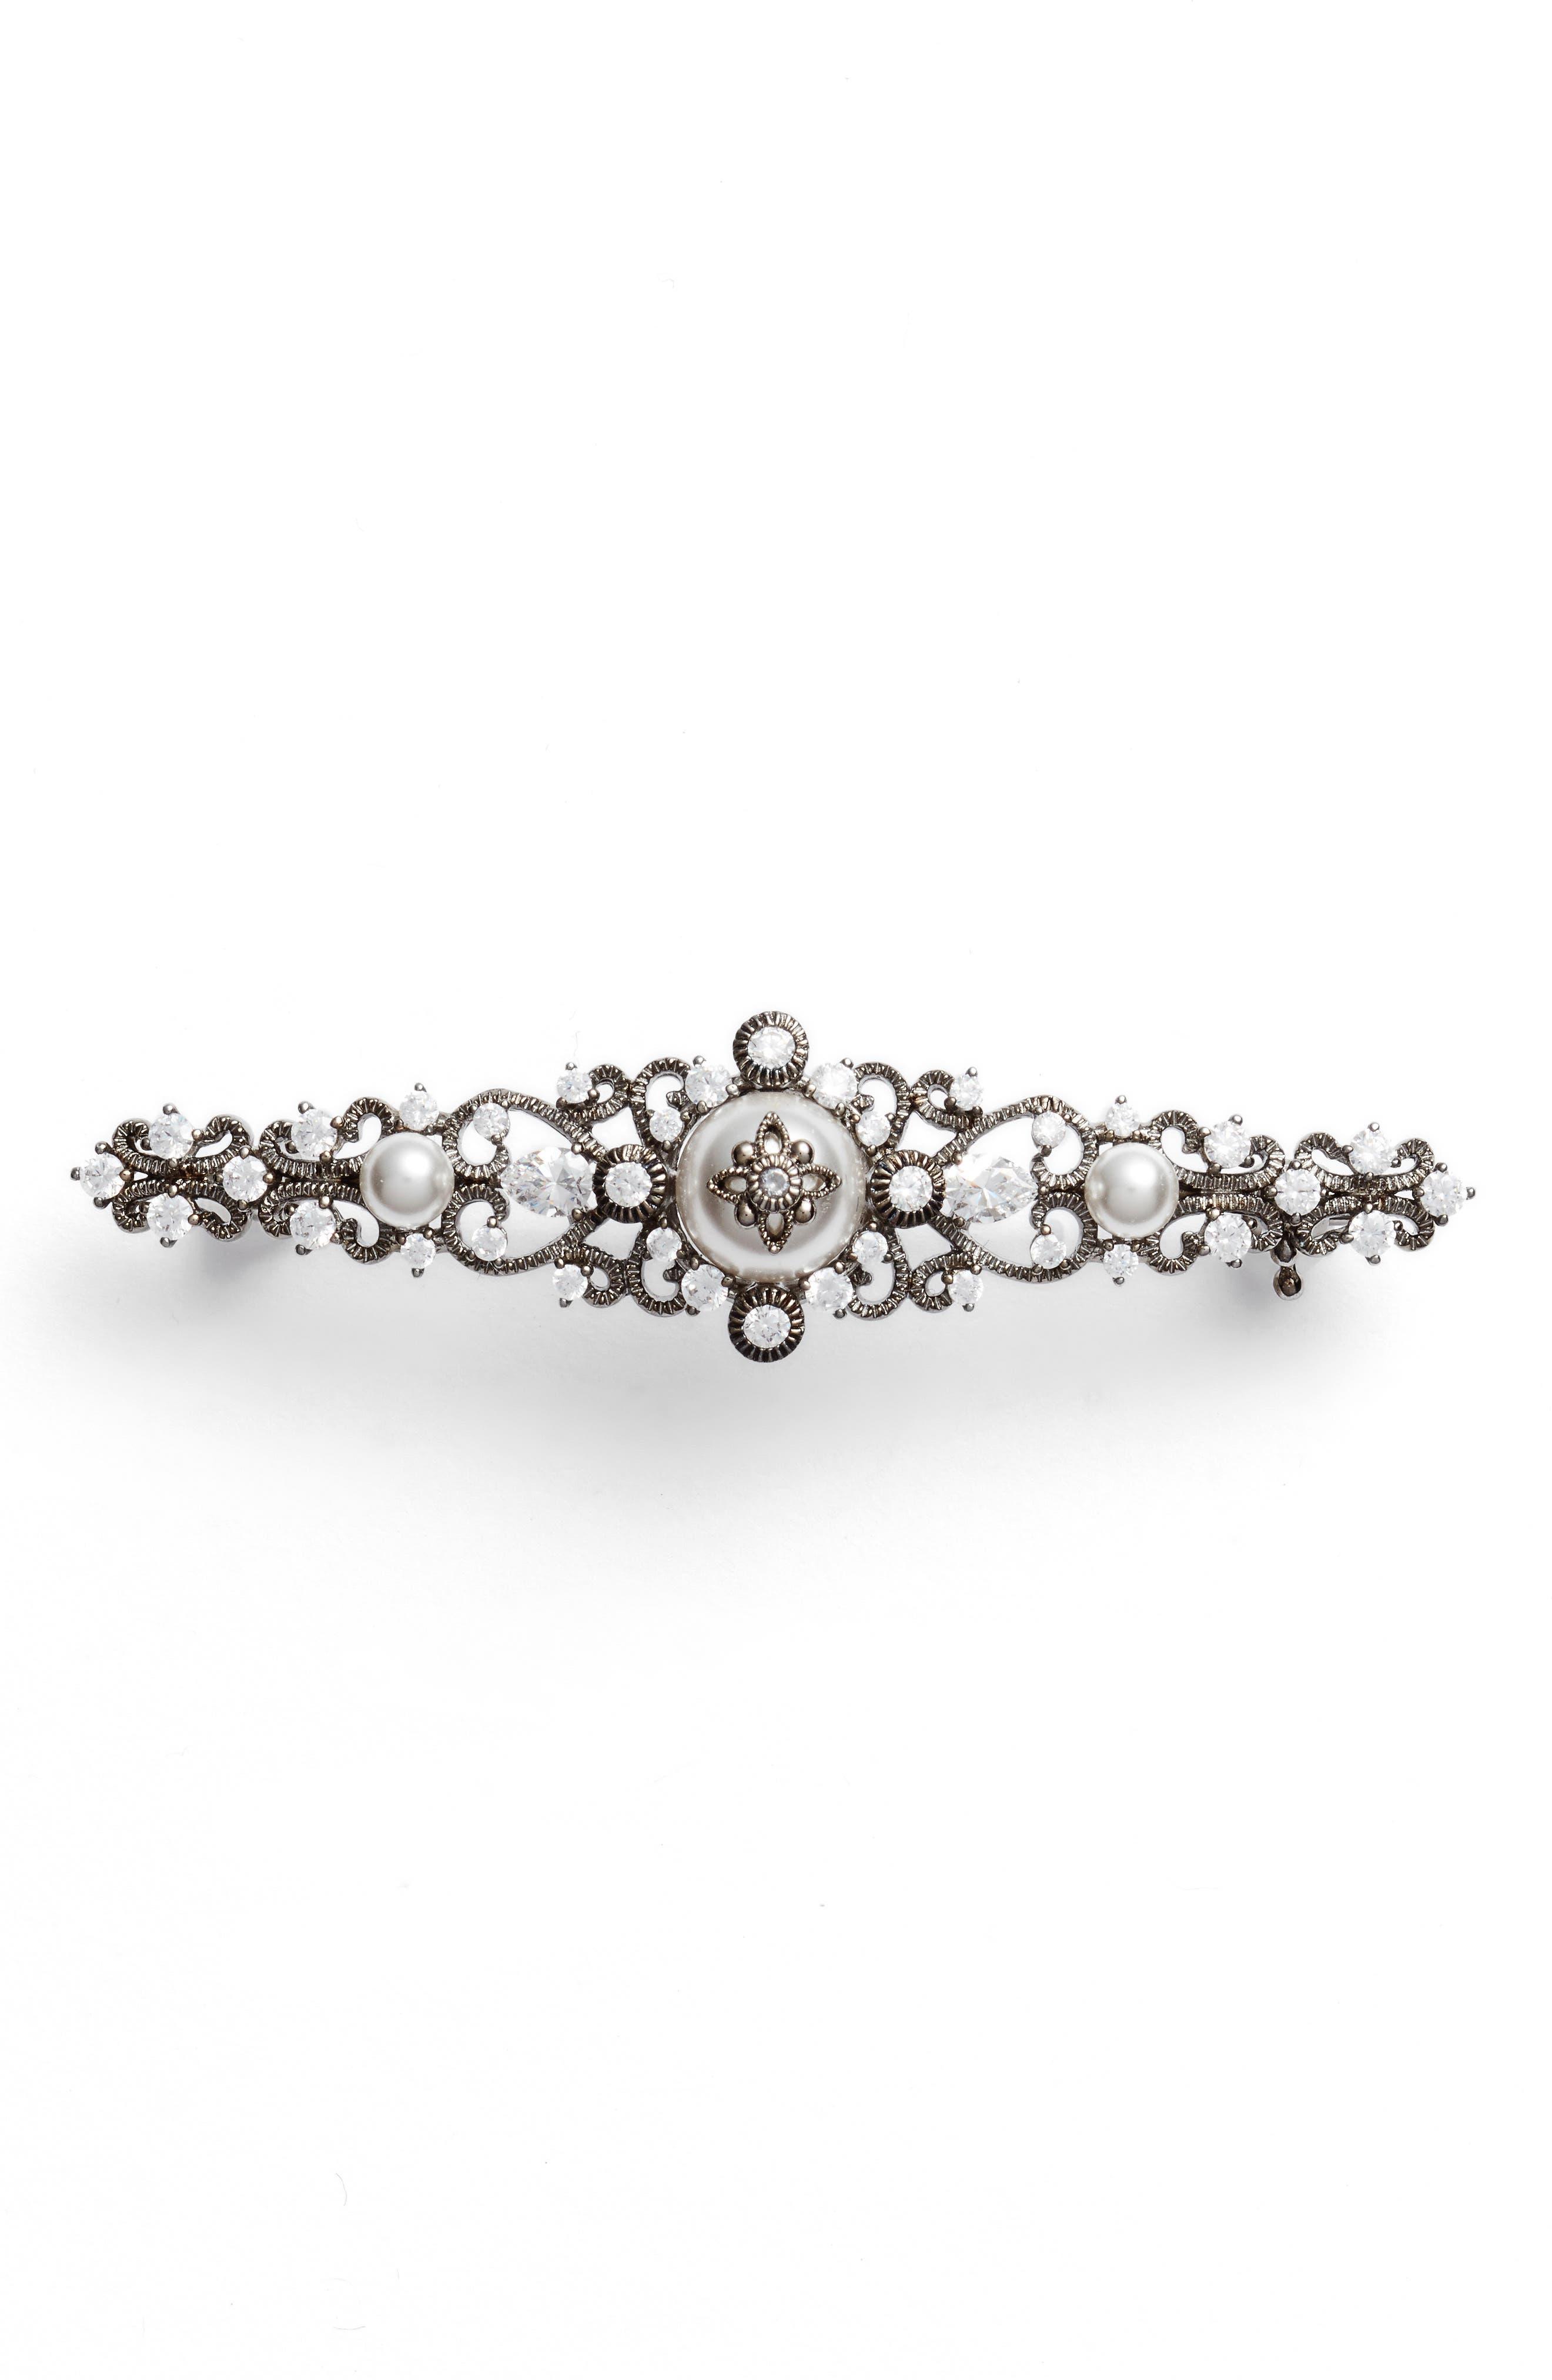 Alternate Image 1 Selected - Nadri Imitation Pearl & Crystal Pin